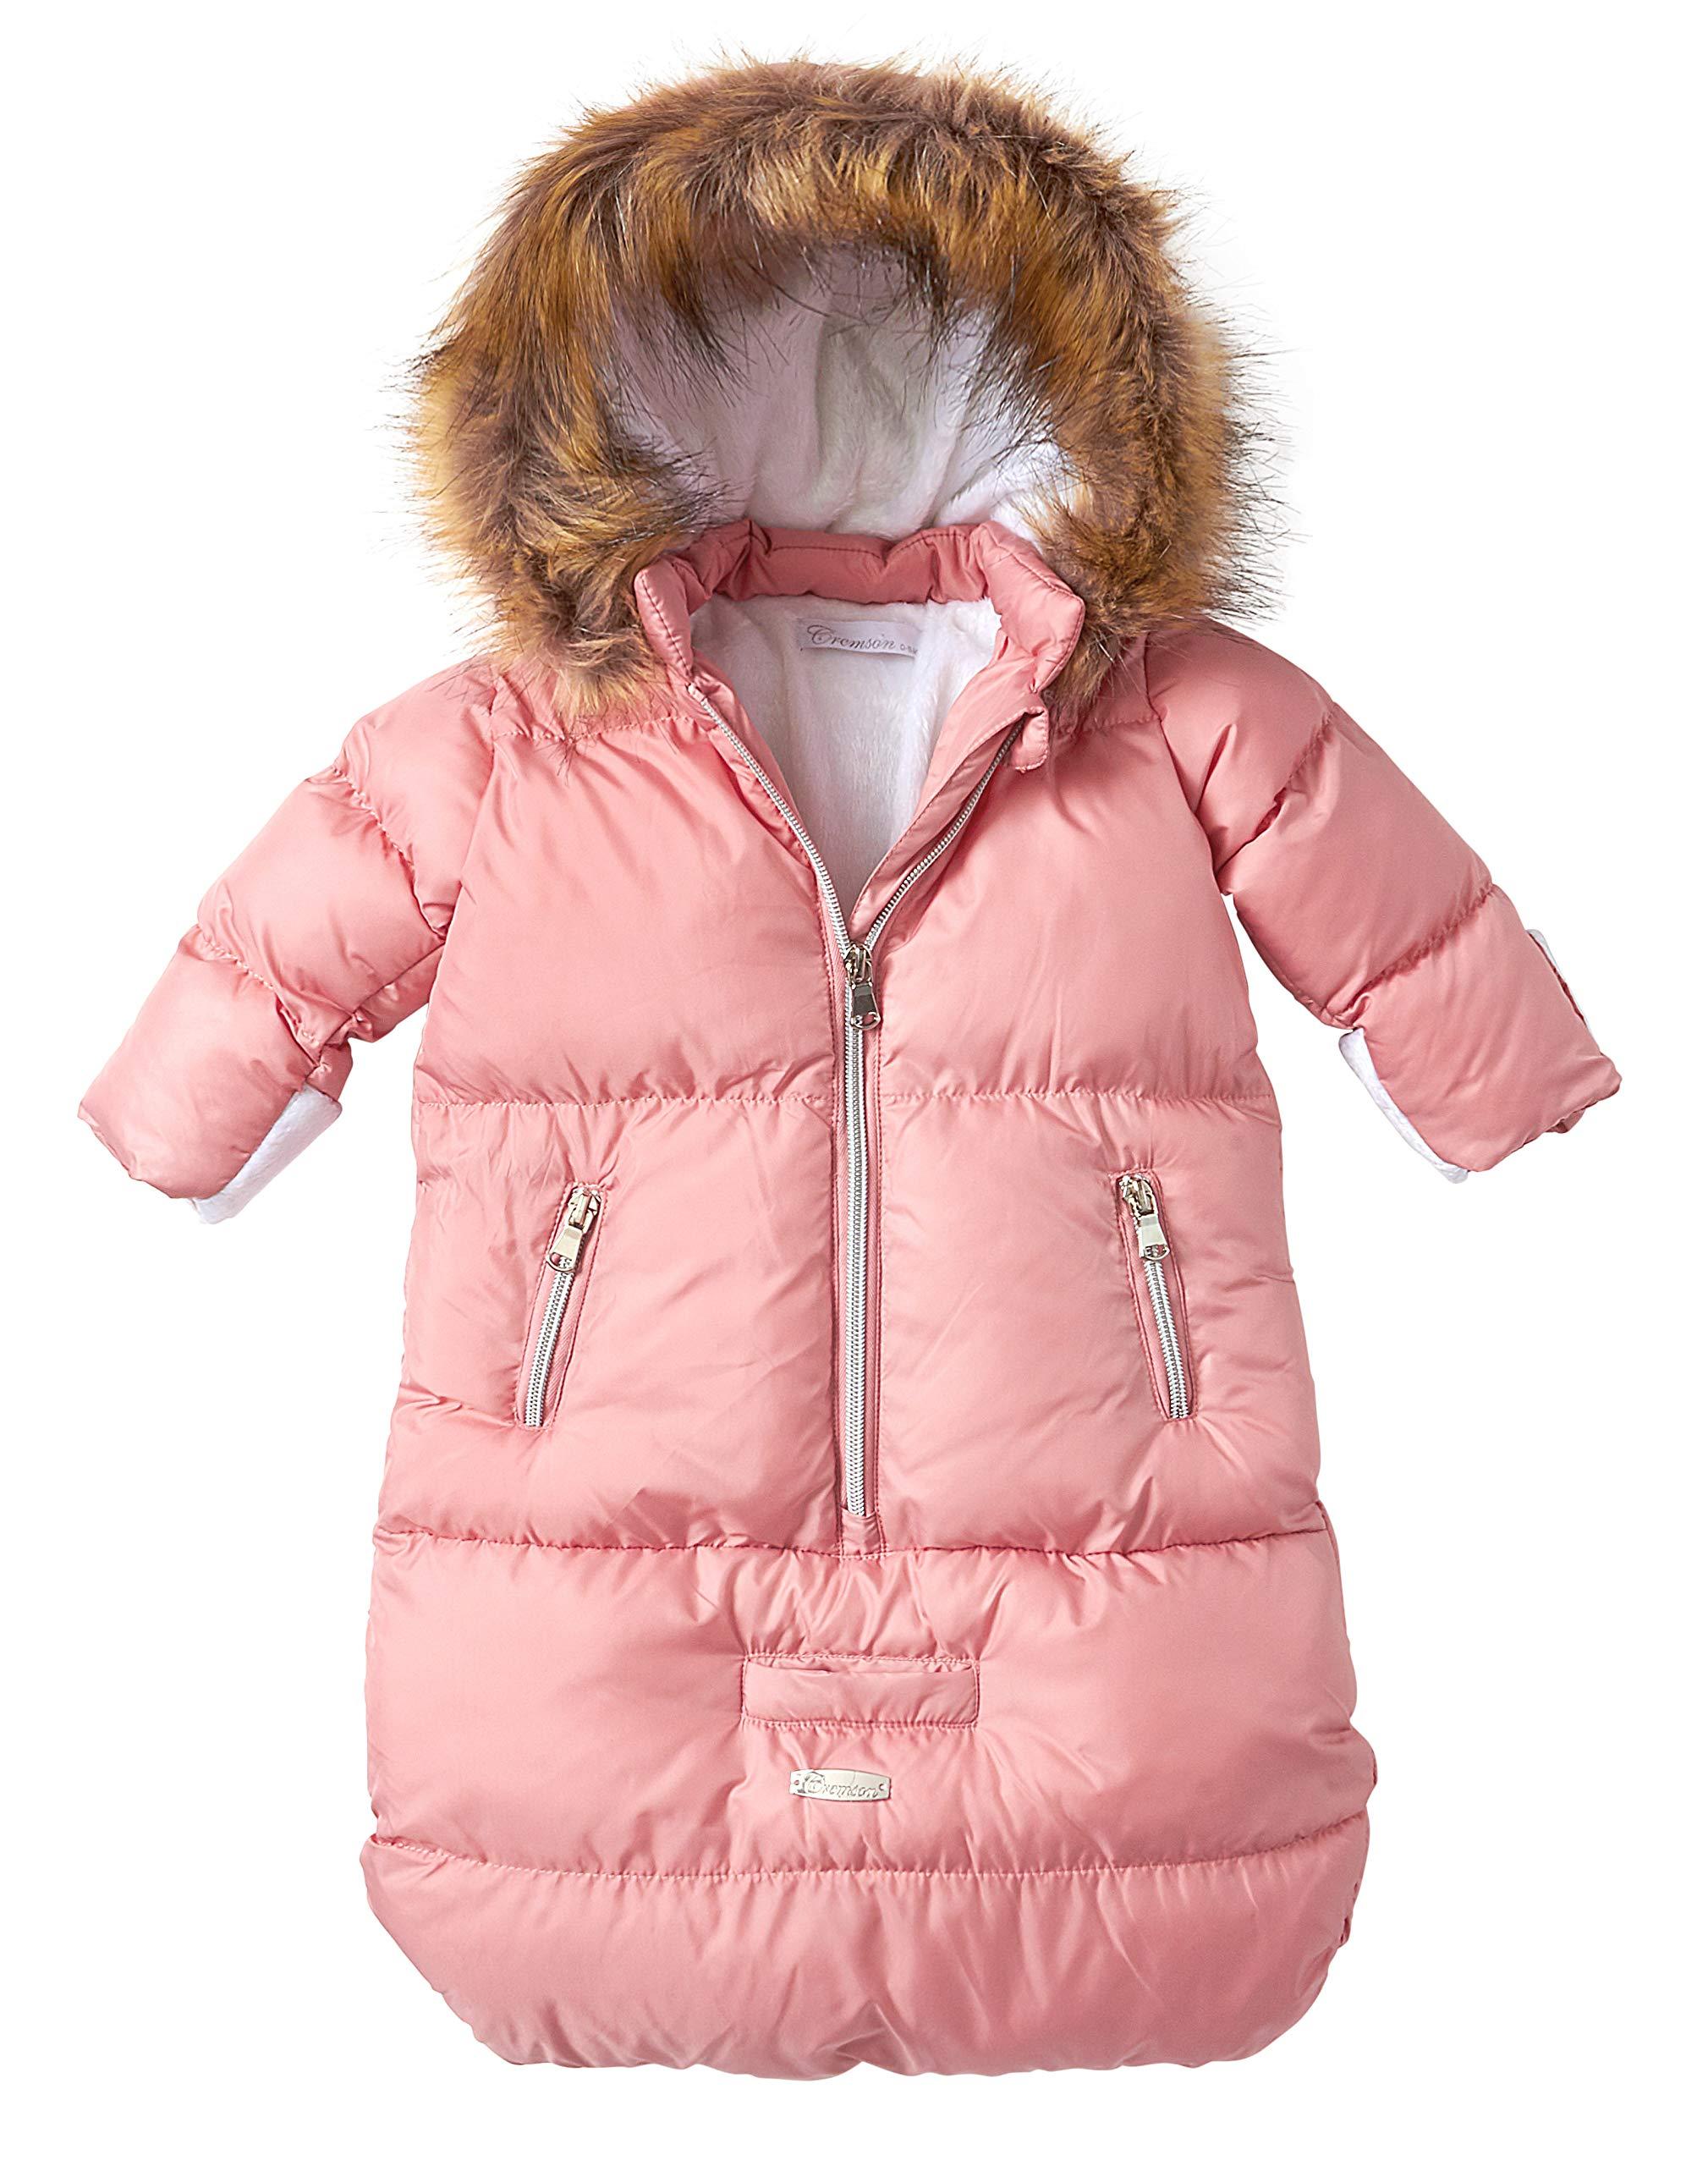 Cremson Girls Boys Newborn Infant Baby Puffer Carbag Pram Bag Snowsuit Bunting - Mauve Pink (Size 0/6M)